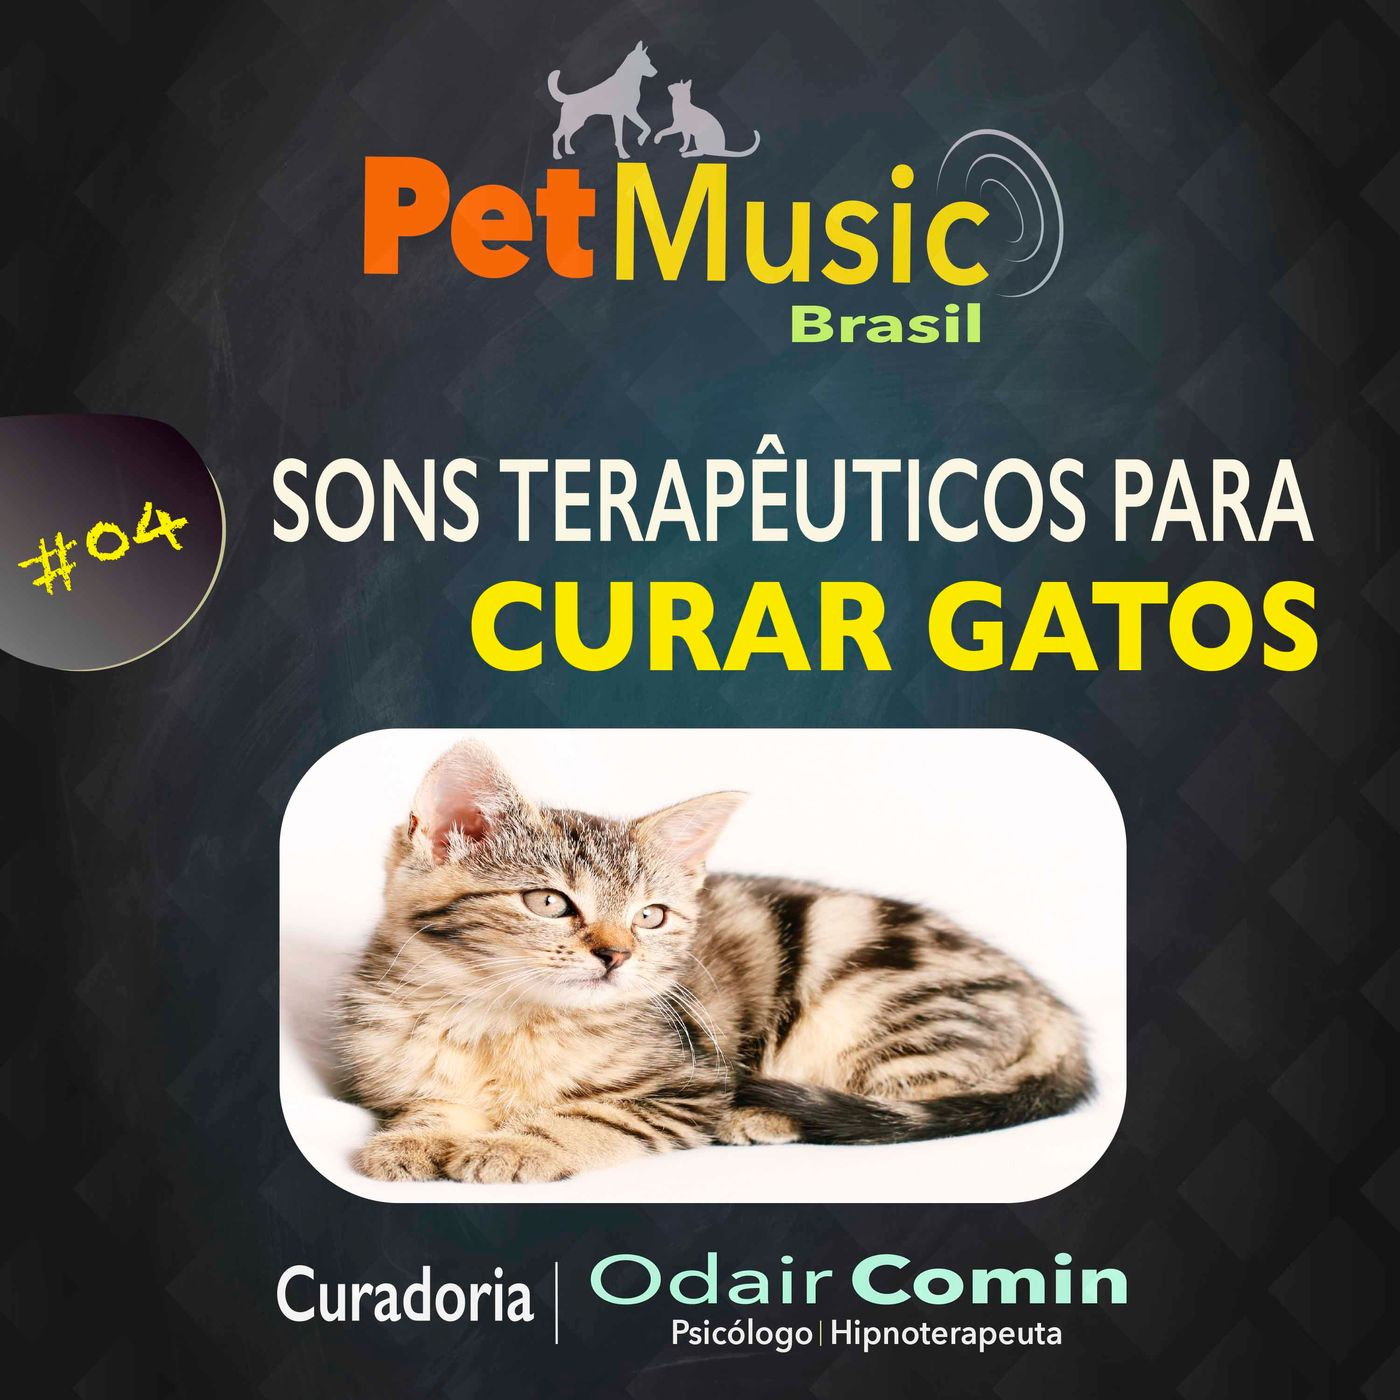 #04 Sons Terapêuticos para Curar Gatos   PetMusic